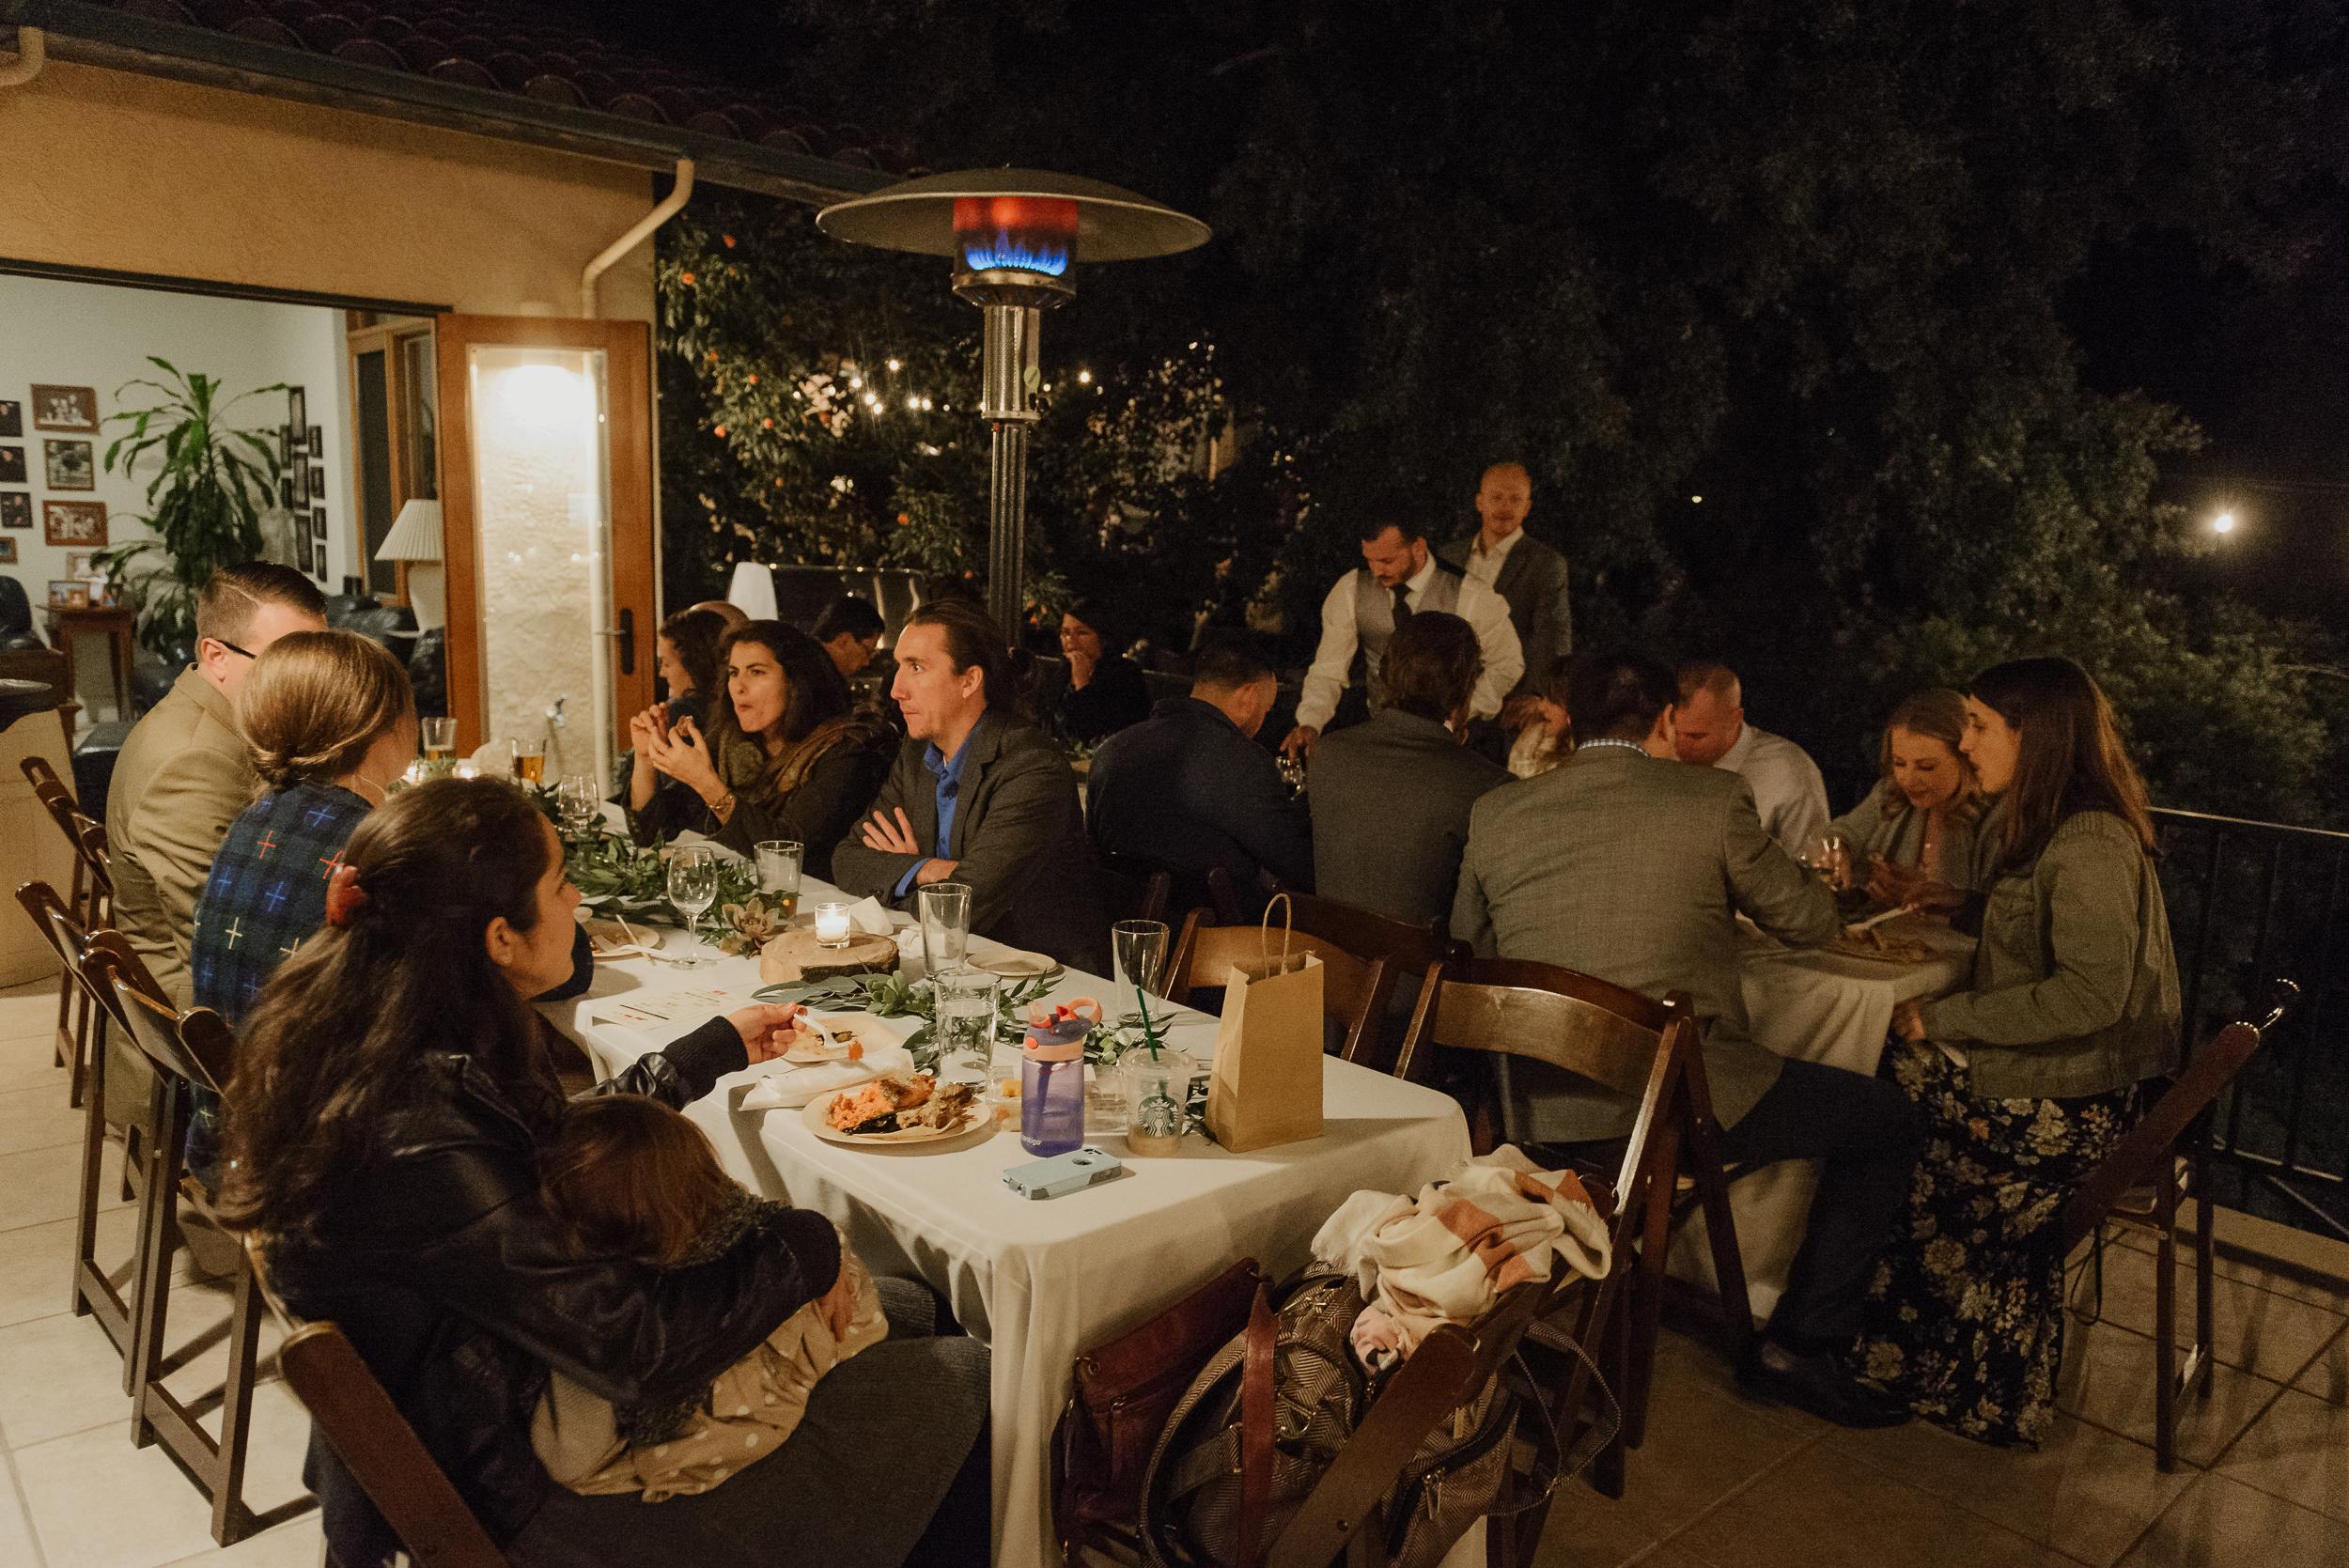 096marin-petaluma-backyard-wedding-vivianchen-602.jpg